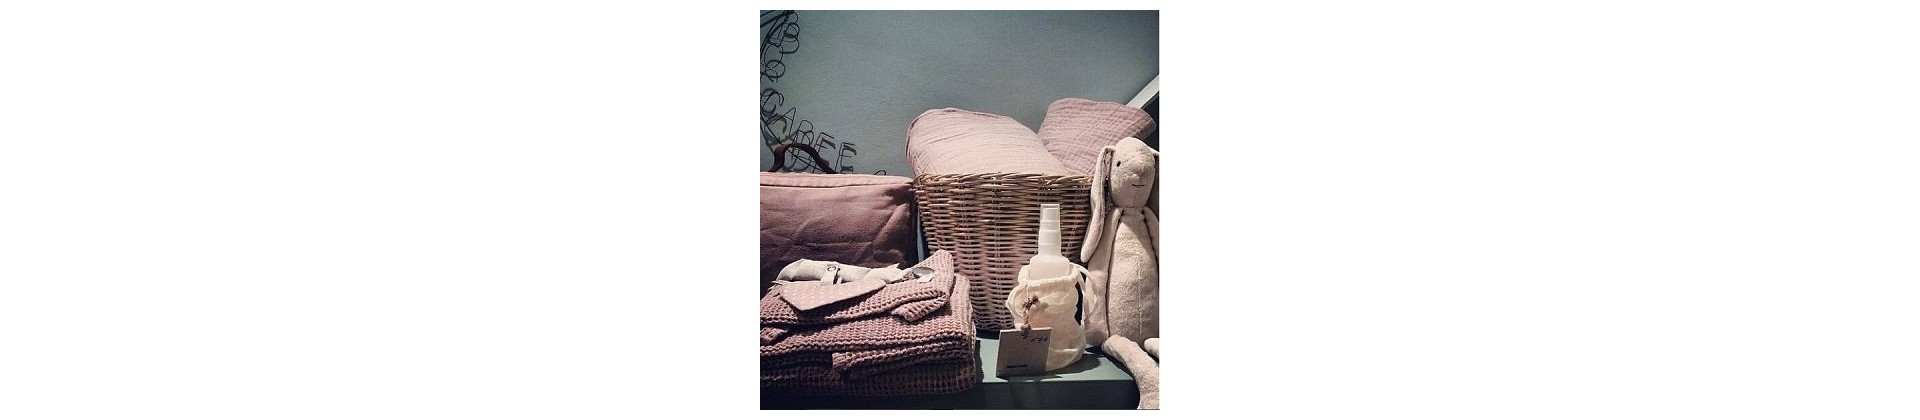 cadeau naissance b b fille original achat vente 4. Black Bedroom Furniture Sets. Home Design Ideas